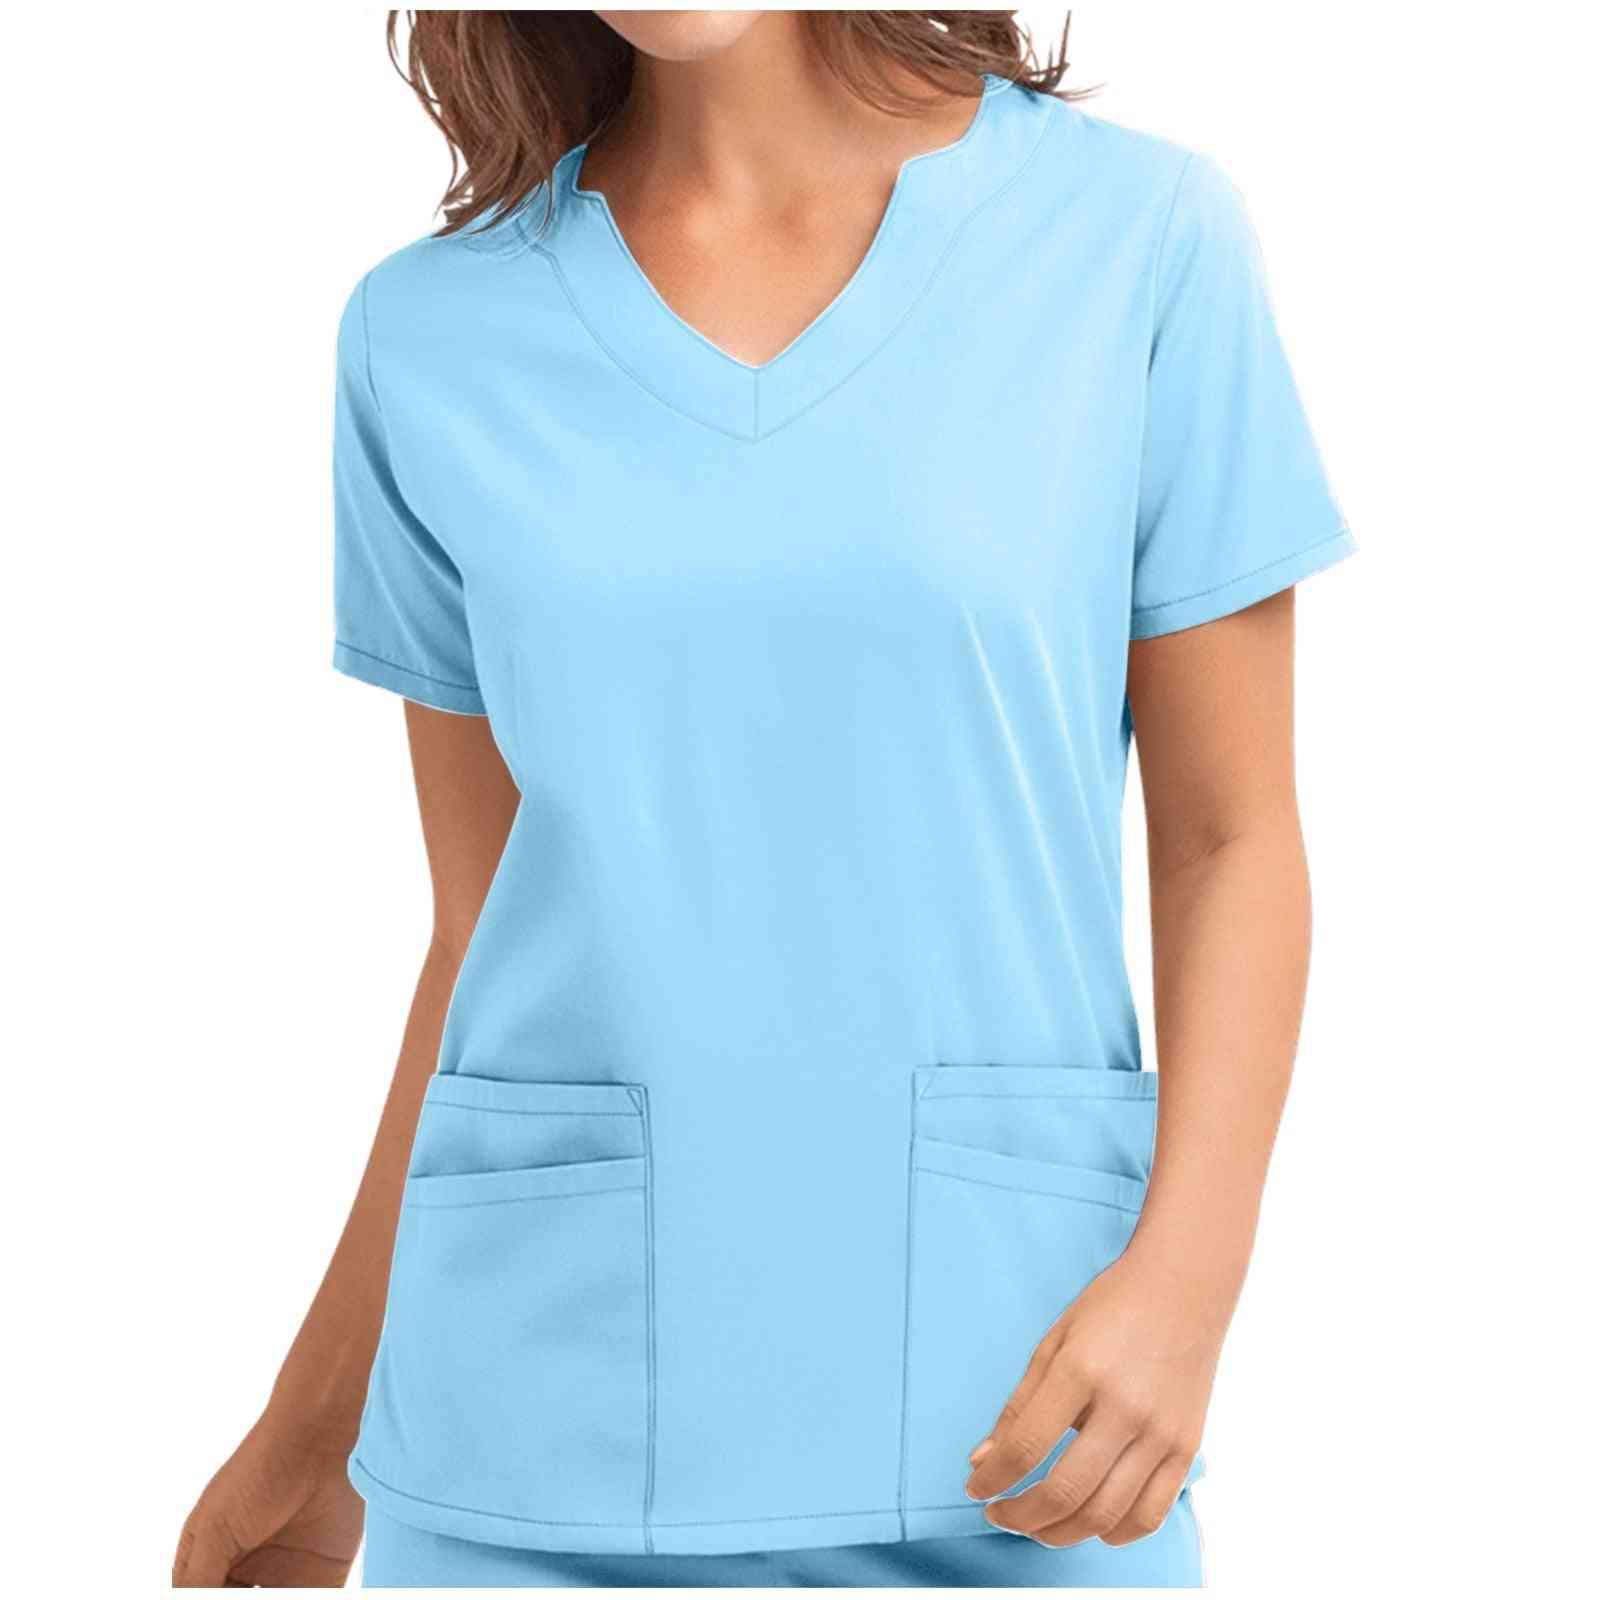 Women High Temperature Sterilizable Clothing Short Sleeve V-neck Tops